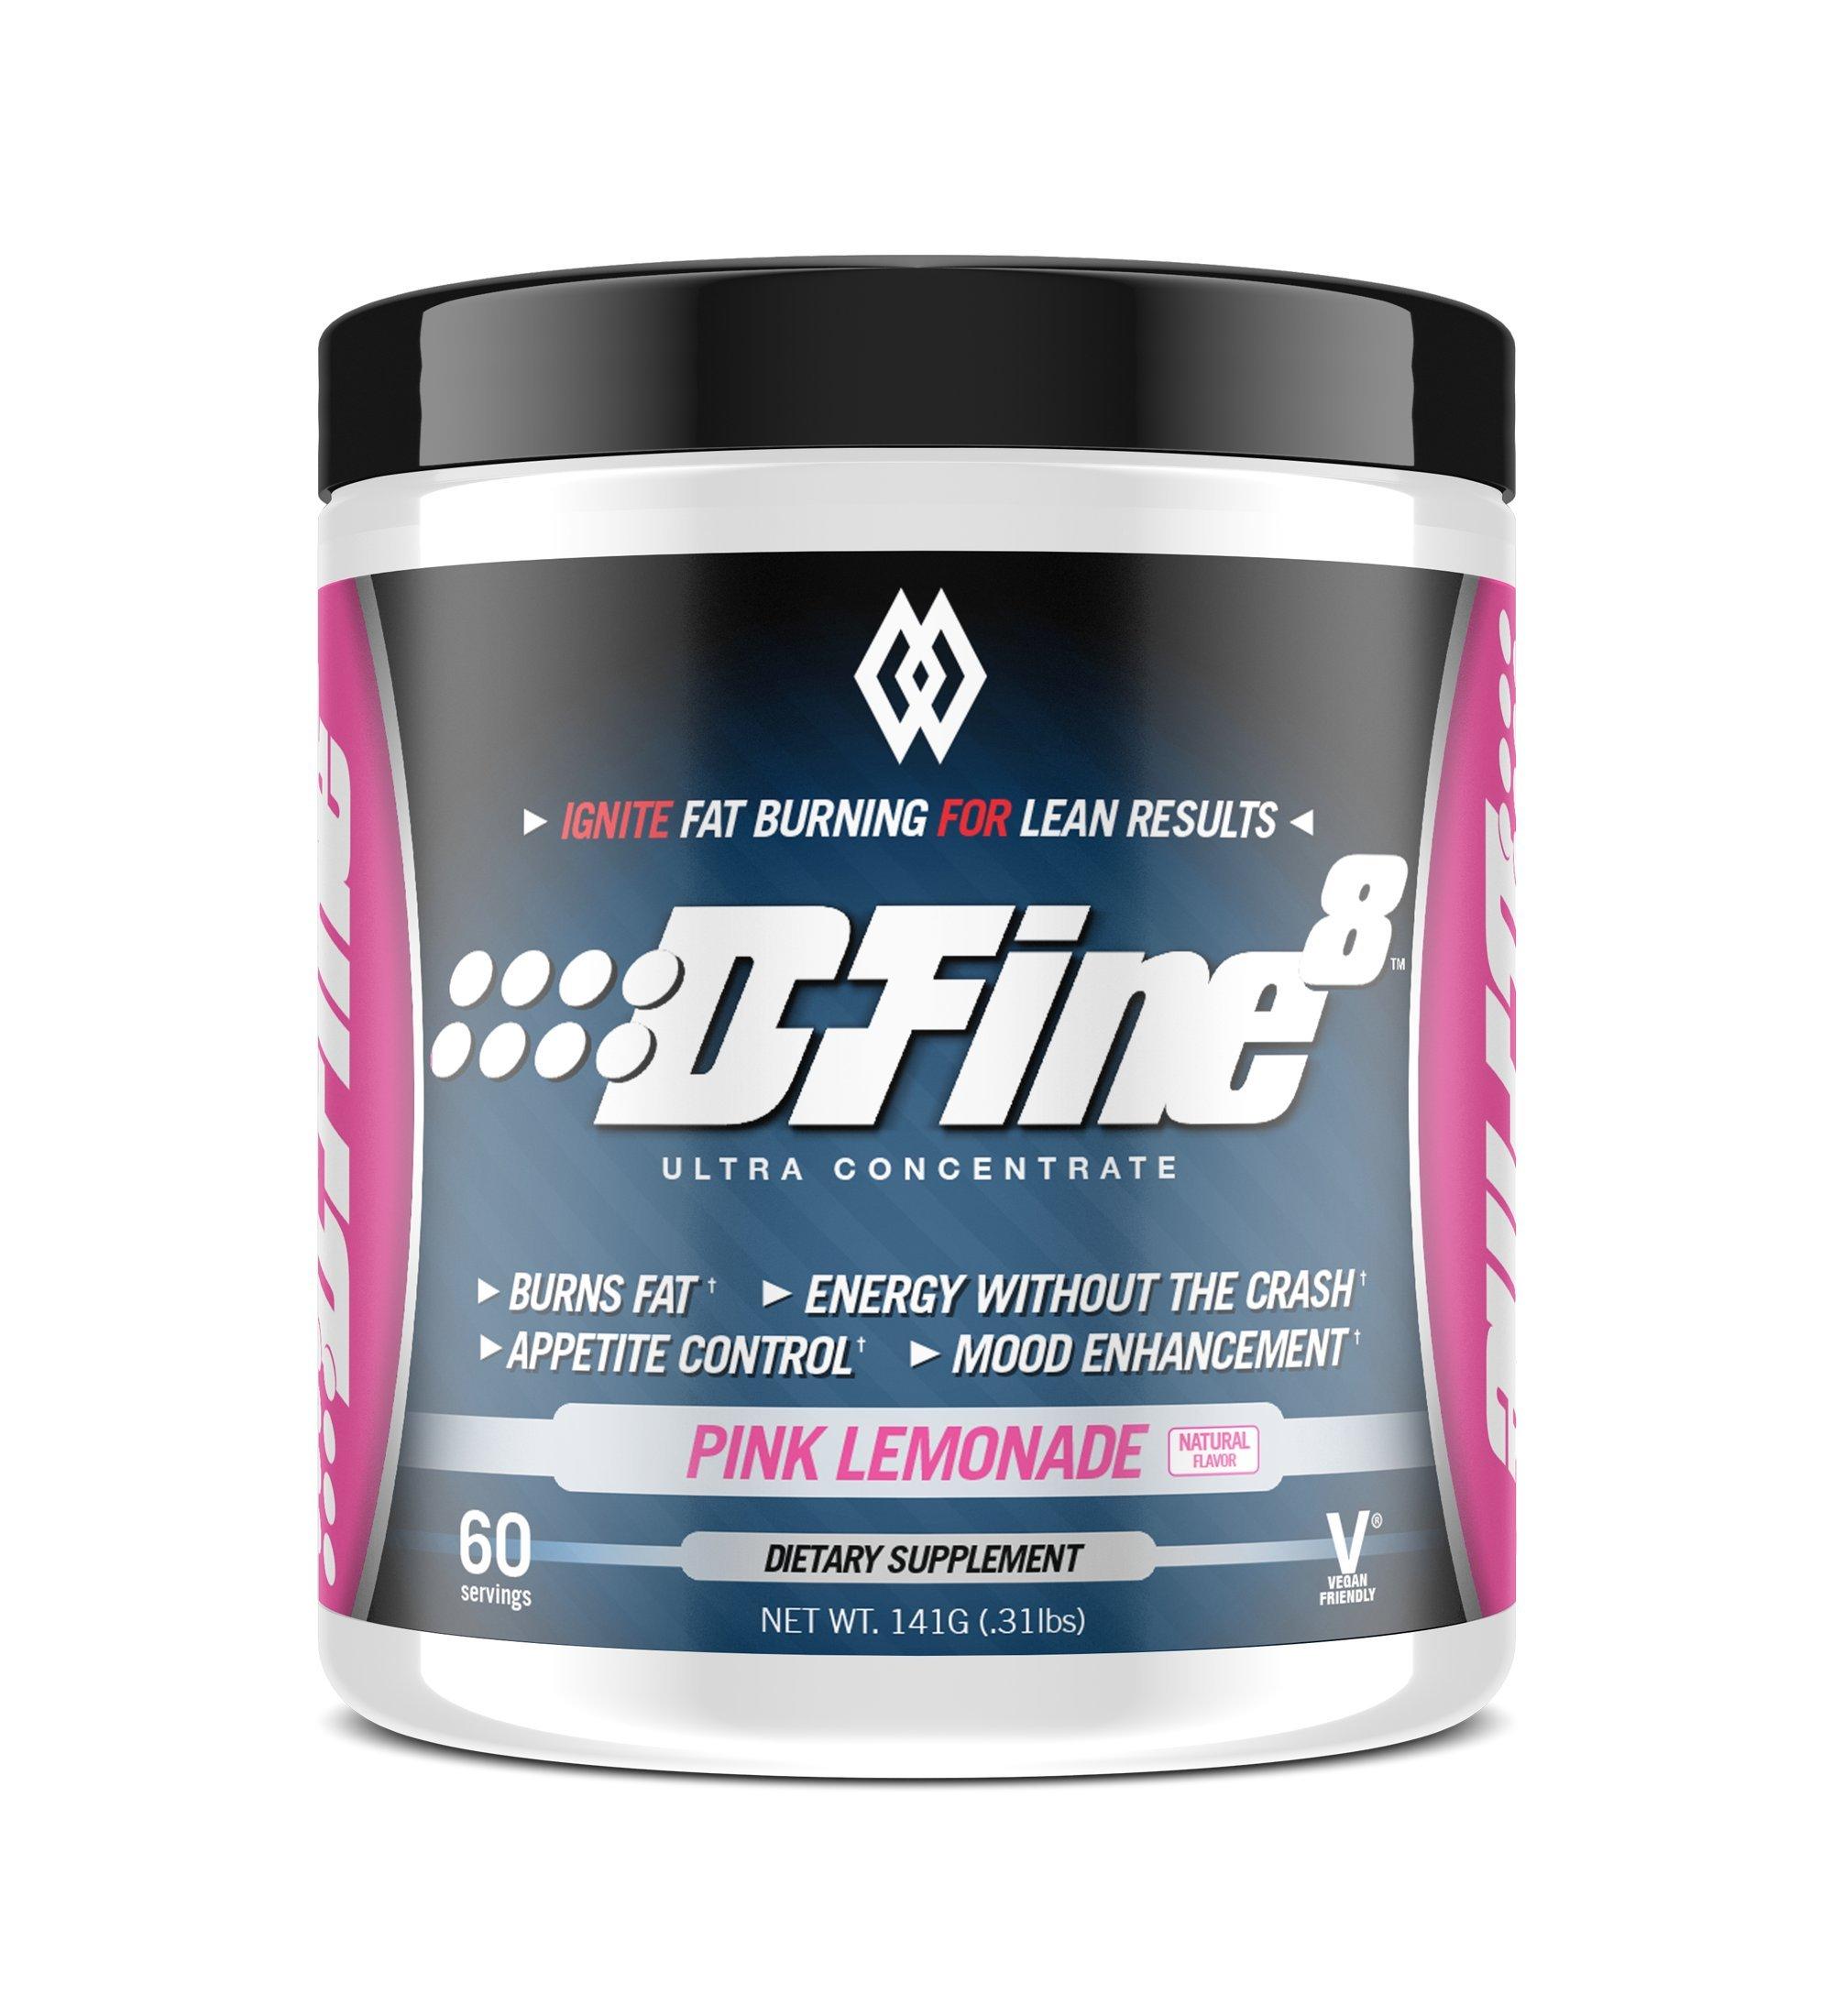 Musclewerks D-Fine8 - Fat Burner Thermogenic, Pre Workout Powder, Appetite Suppressant, Energy & Weight Loss Supplement for Men & Women - 60 Servings Vegan Friendly (Pink Lemonade)